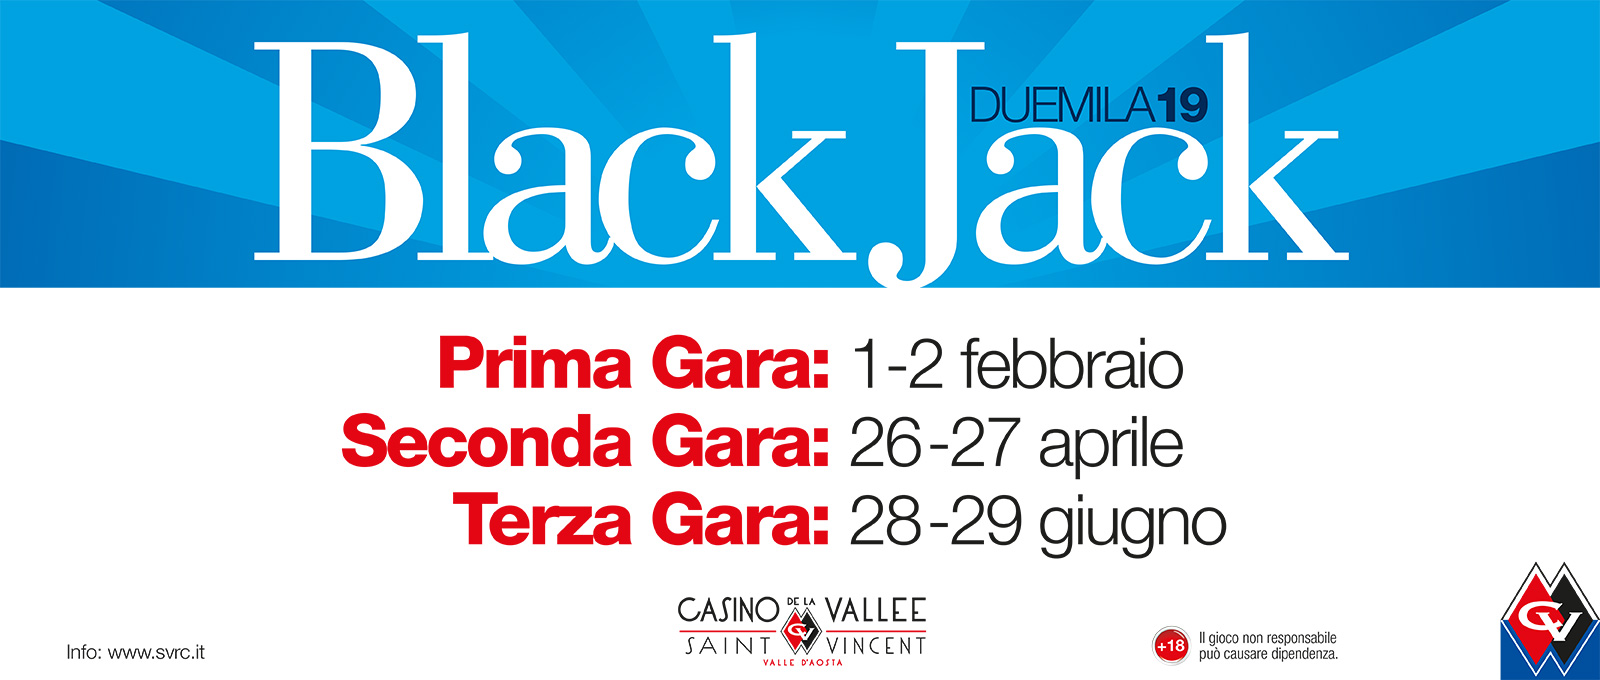 BLACKJACK 2019